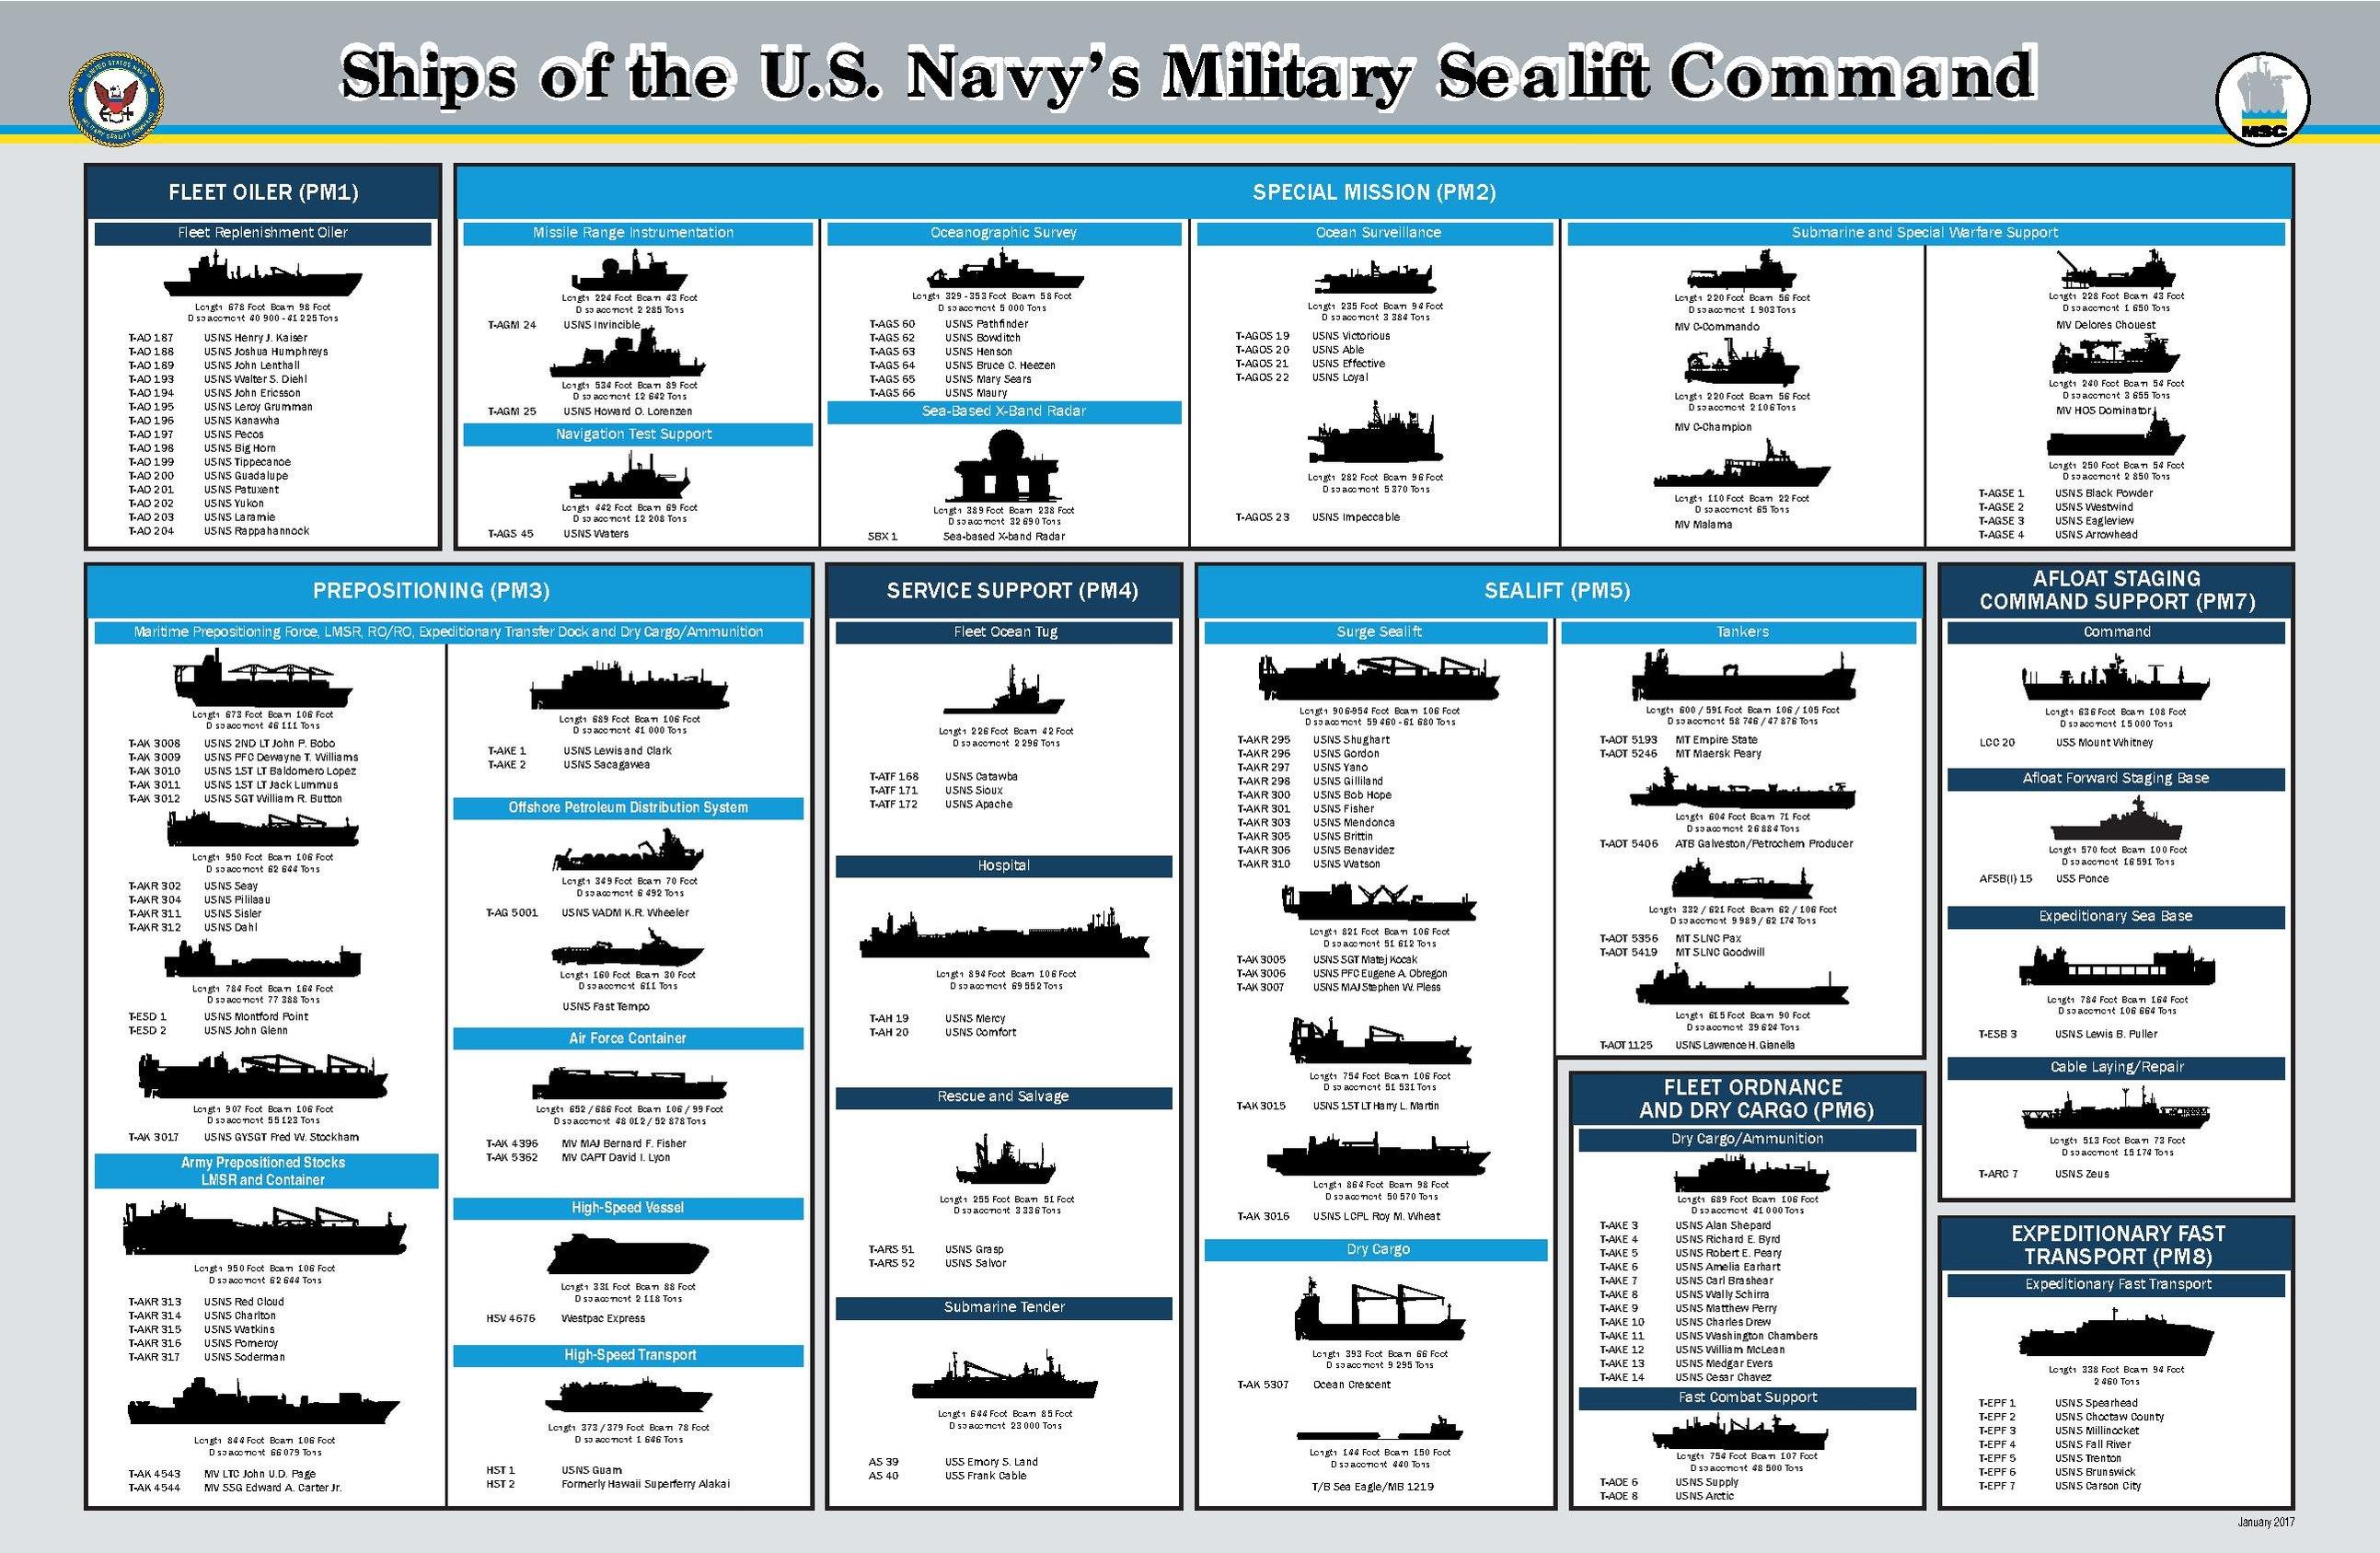 Military Sealift Command - Wikipedia